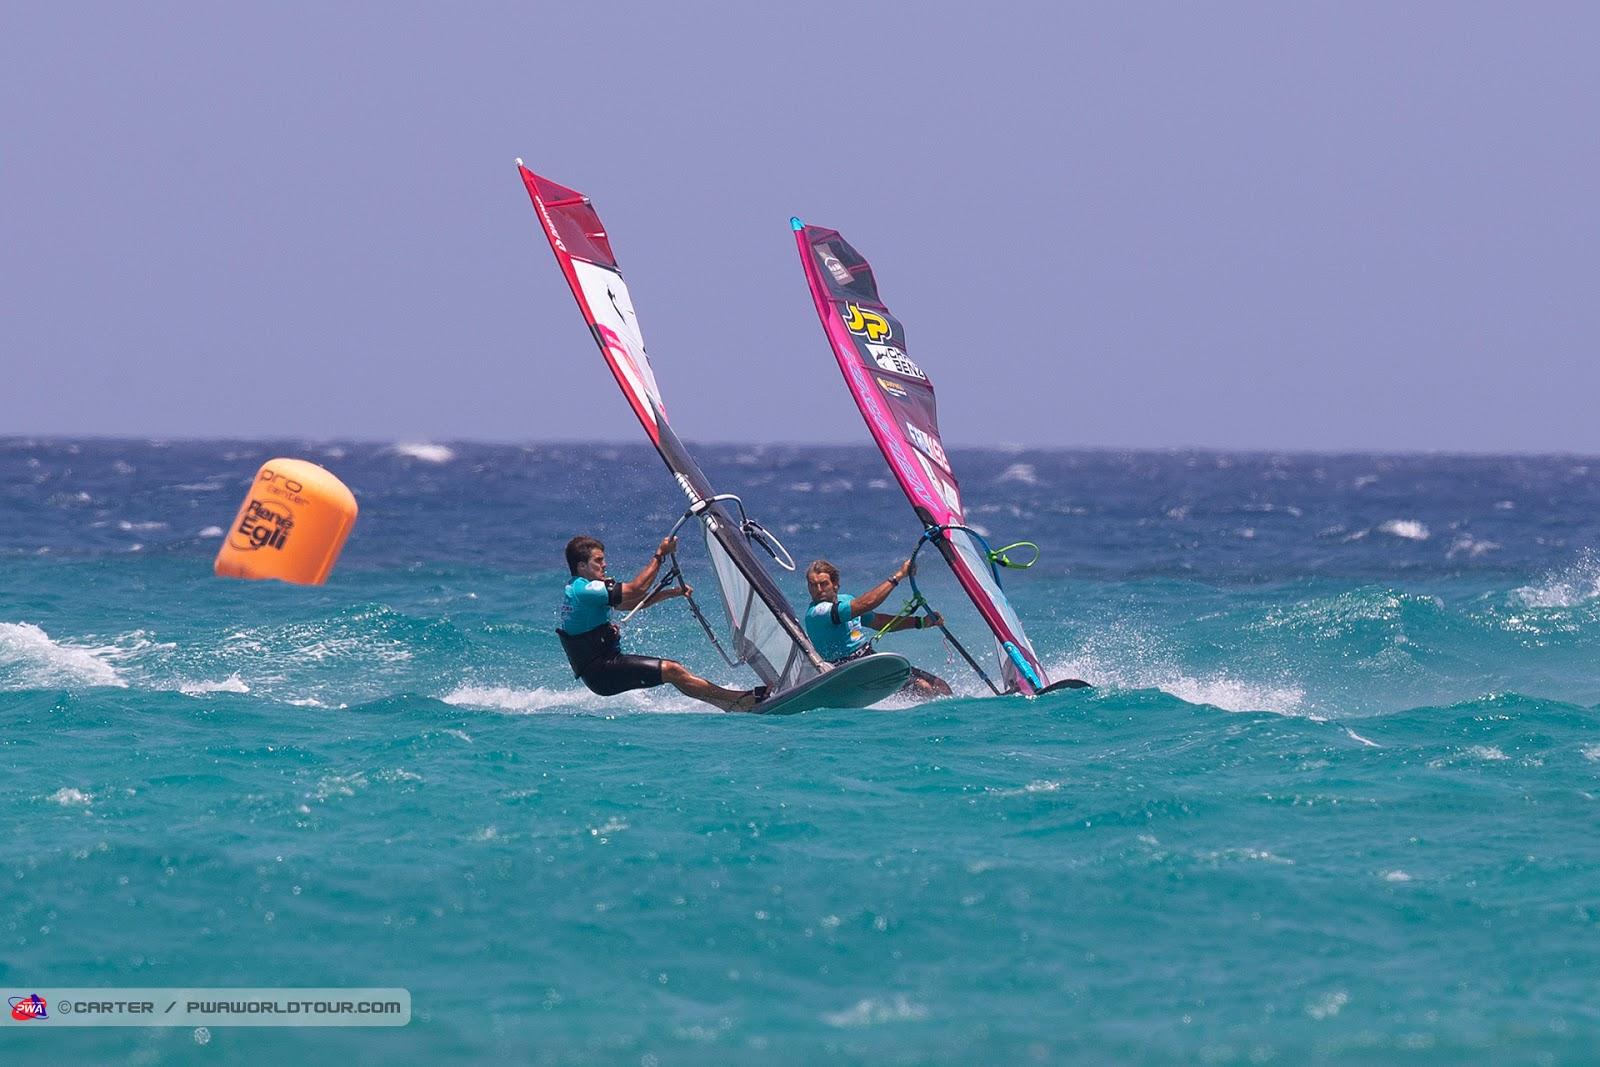 Phil's Windsurfing Blog